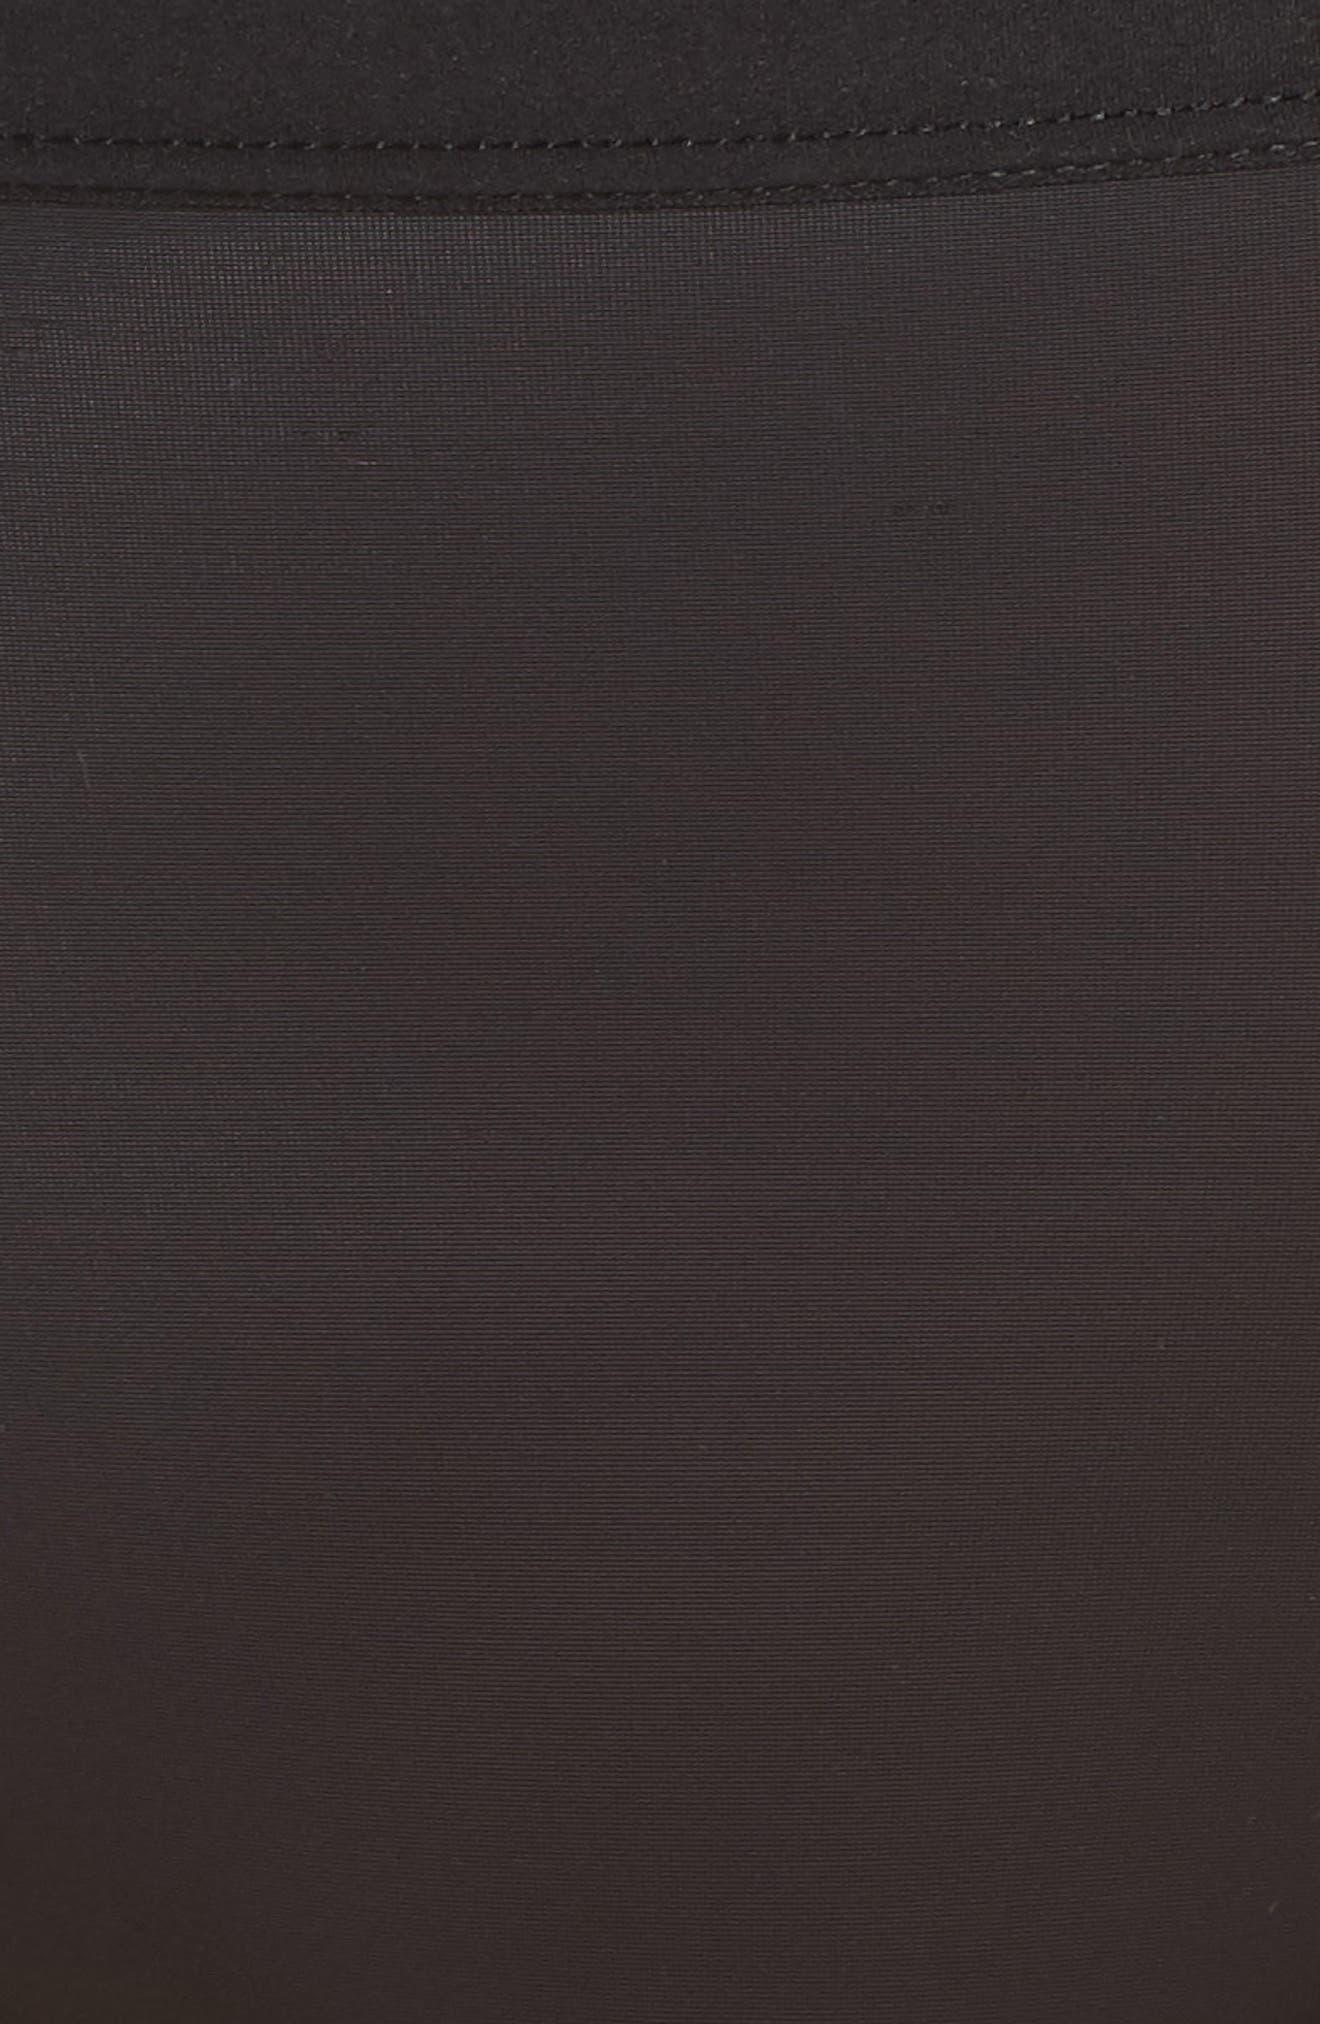 Flawless Comfort High Cut Briefs,                             Alternate thumbnail 5, color,                             BLACK